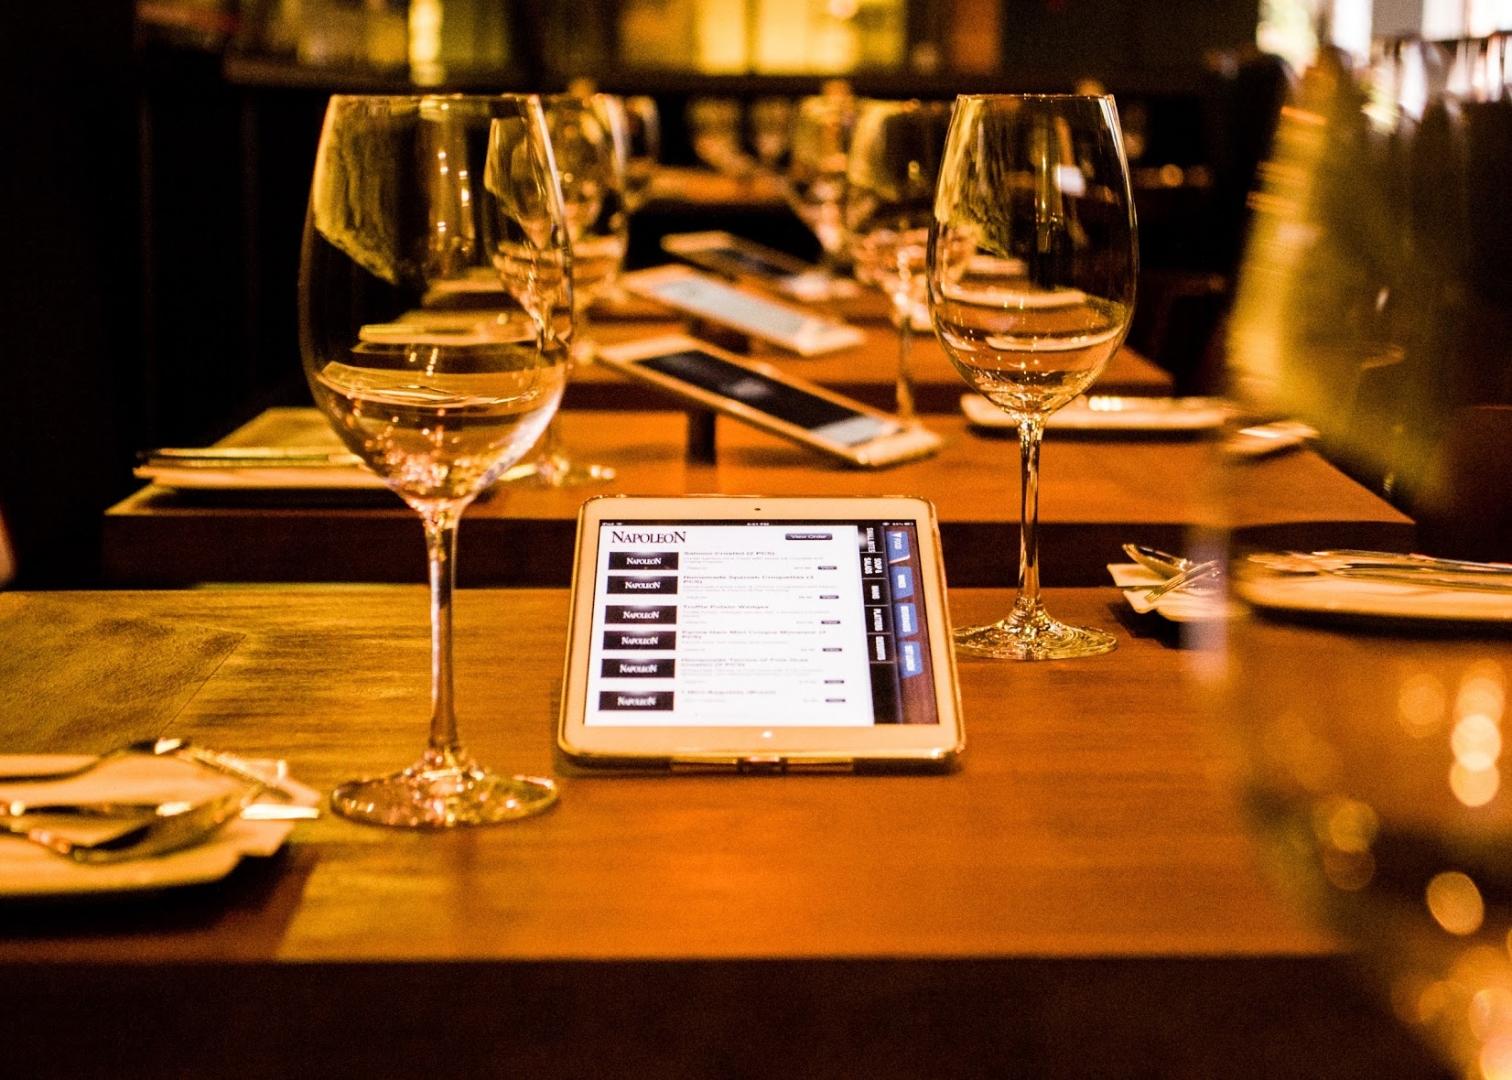 carte des vins restaurant